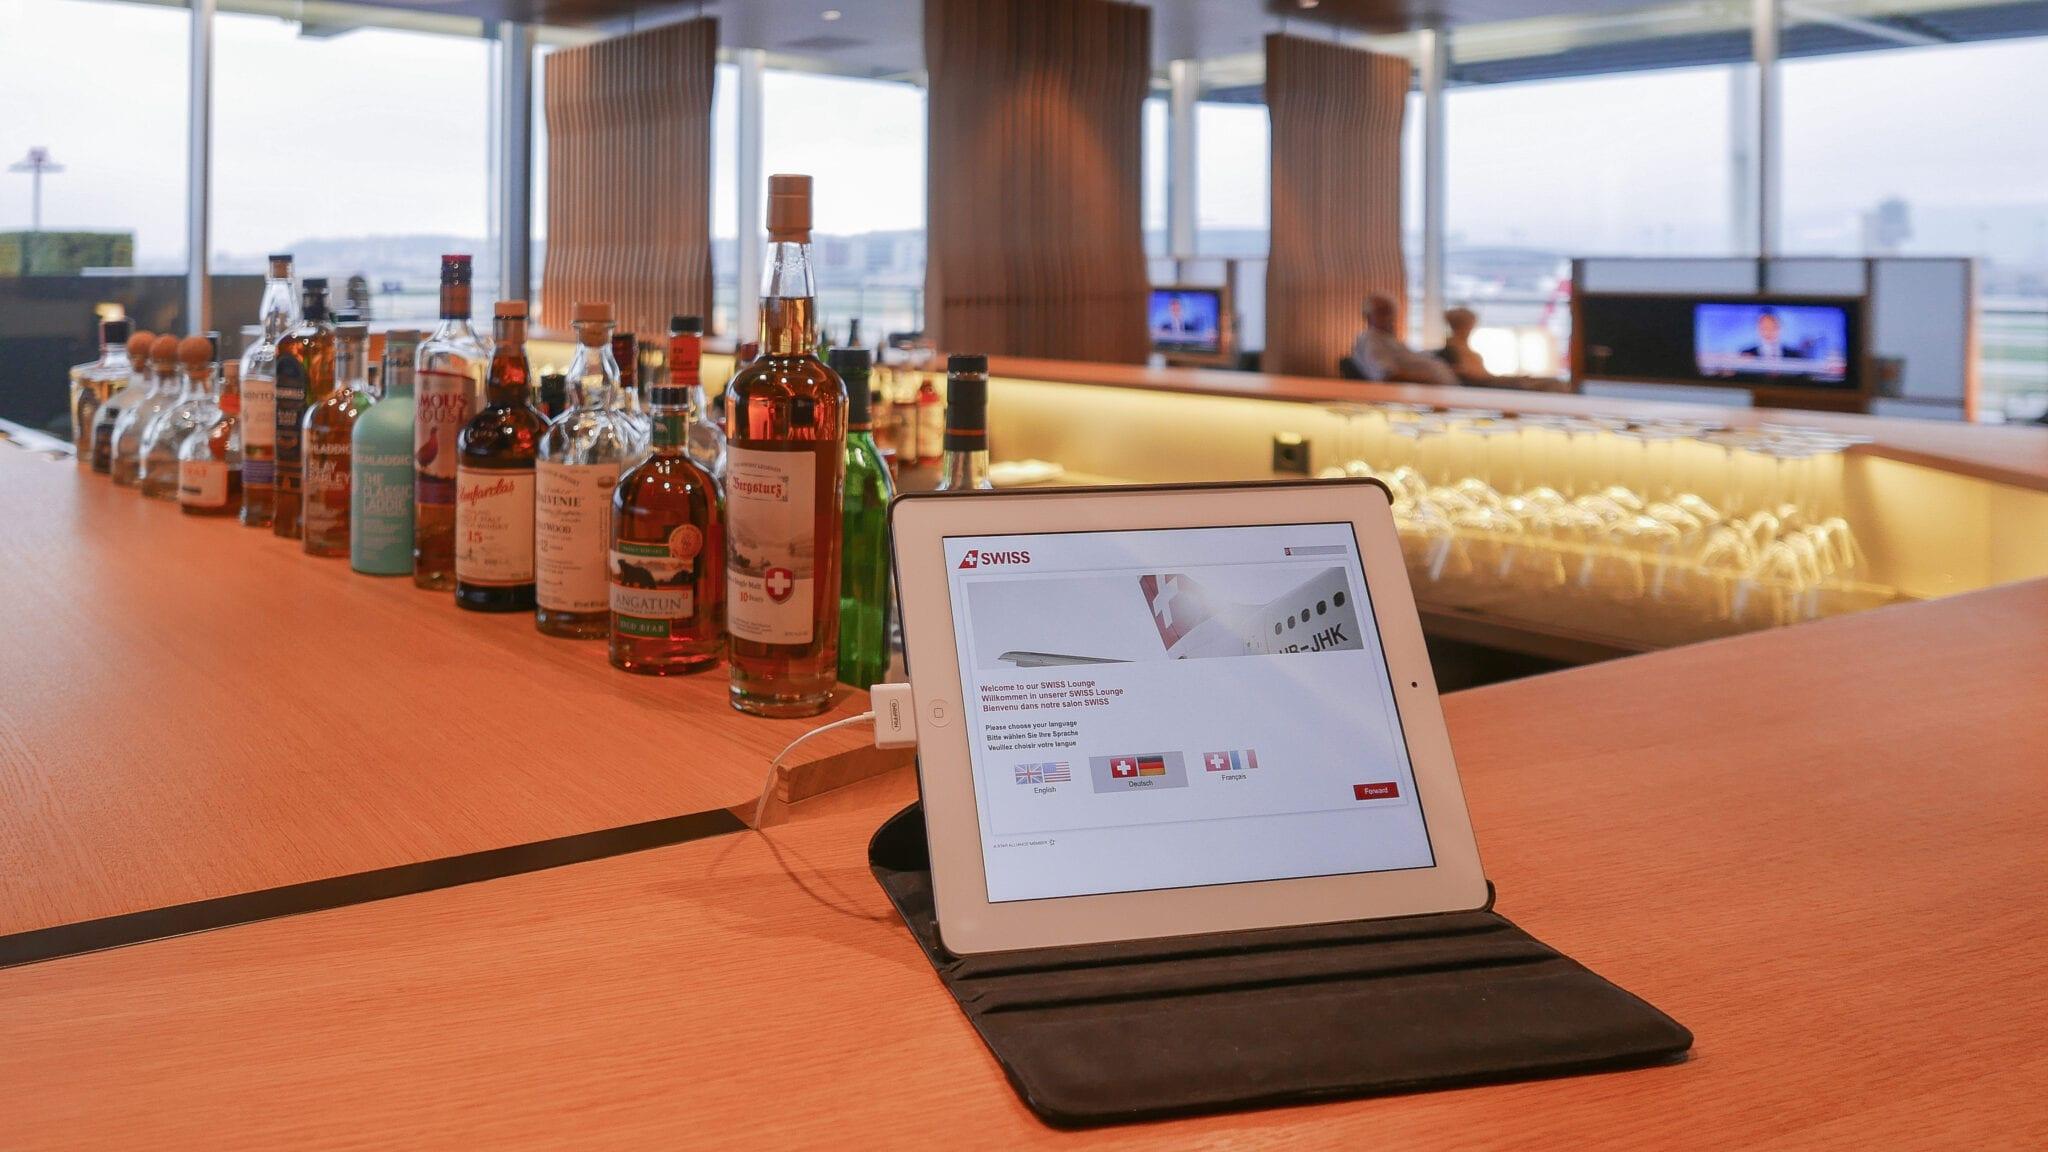 LX F ZRH E gates 8 - REVIEW - SWISS First Class Lounge - Zurich (ZRH E-Gates)